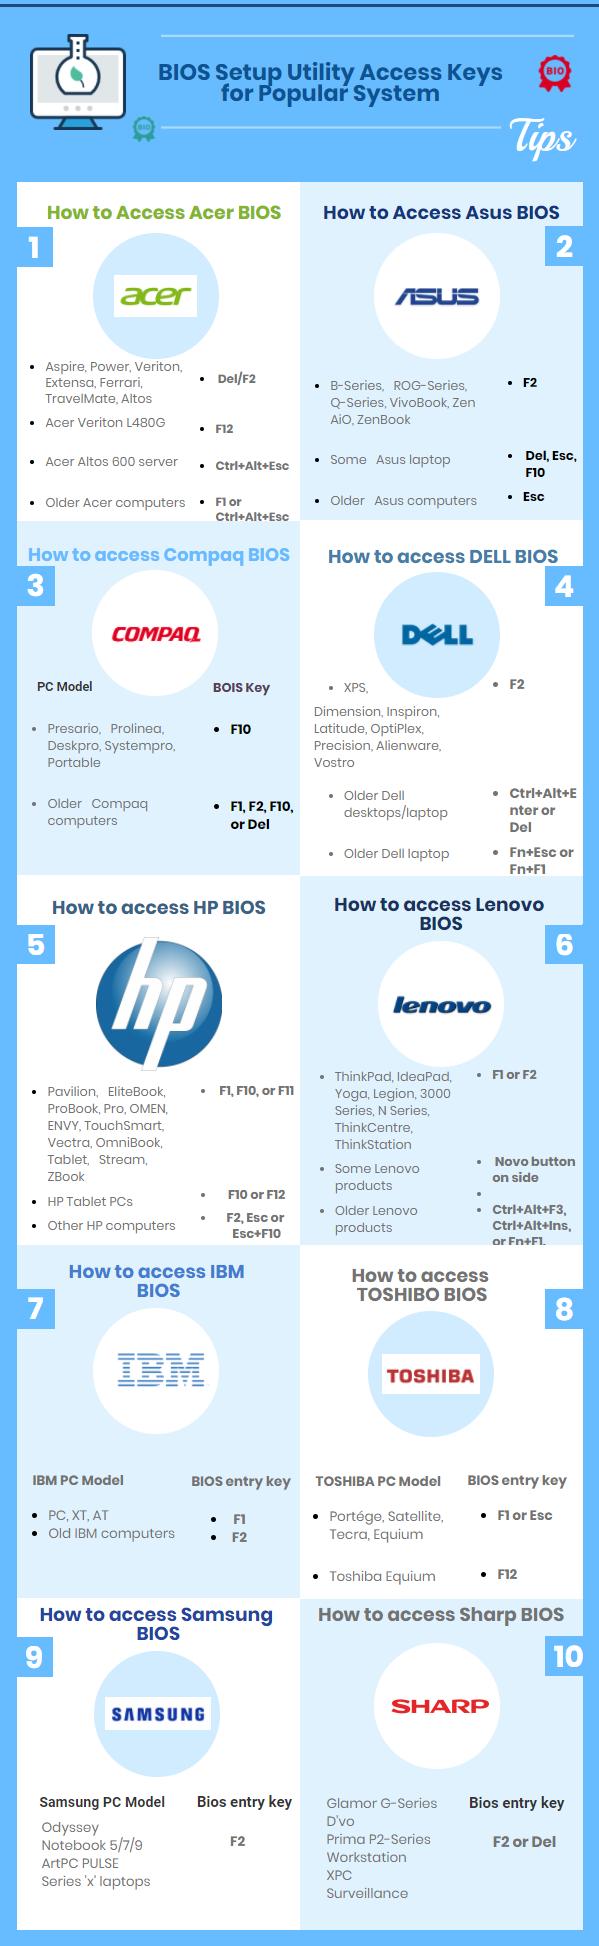 BIOS setup utility access keys for popular system